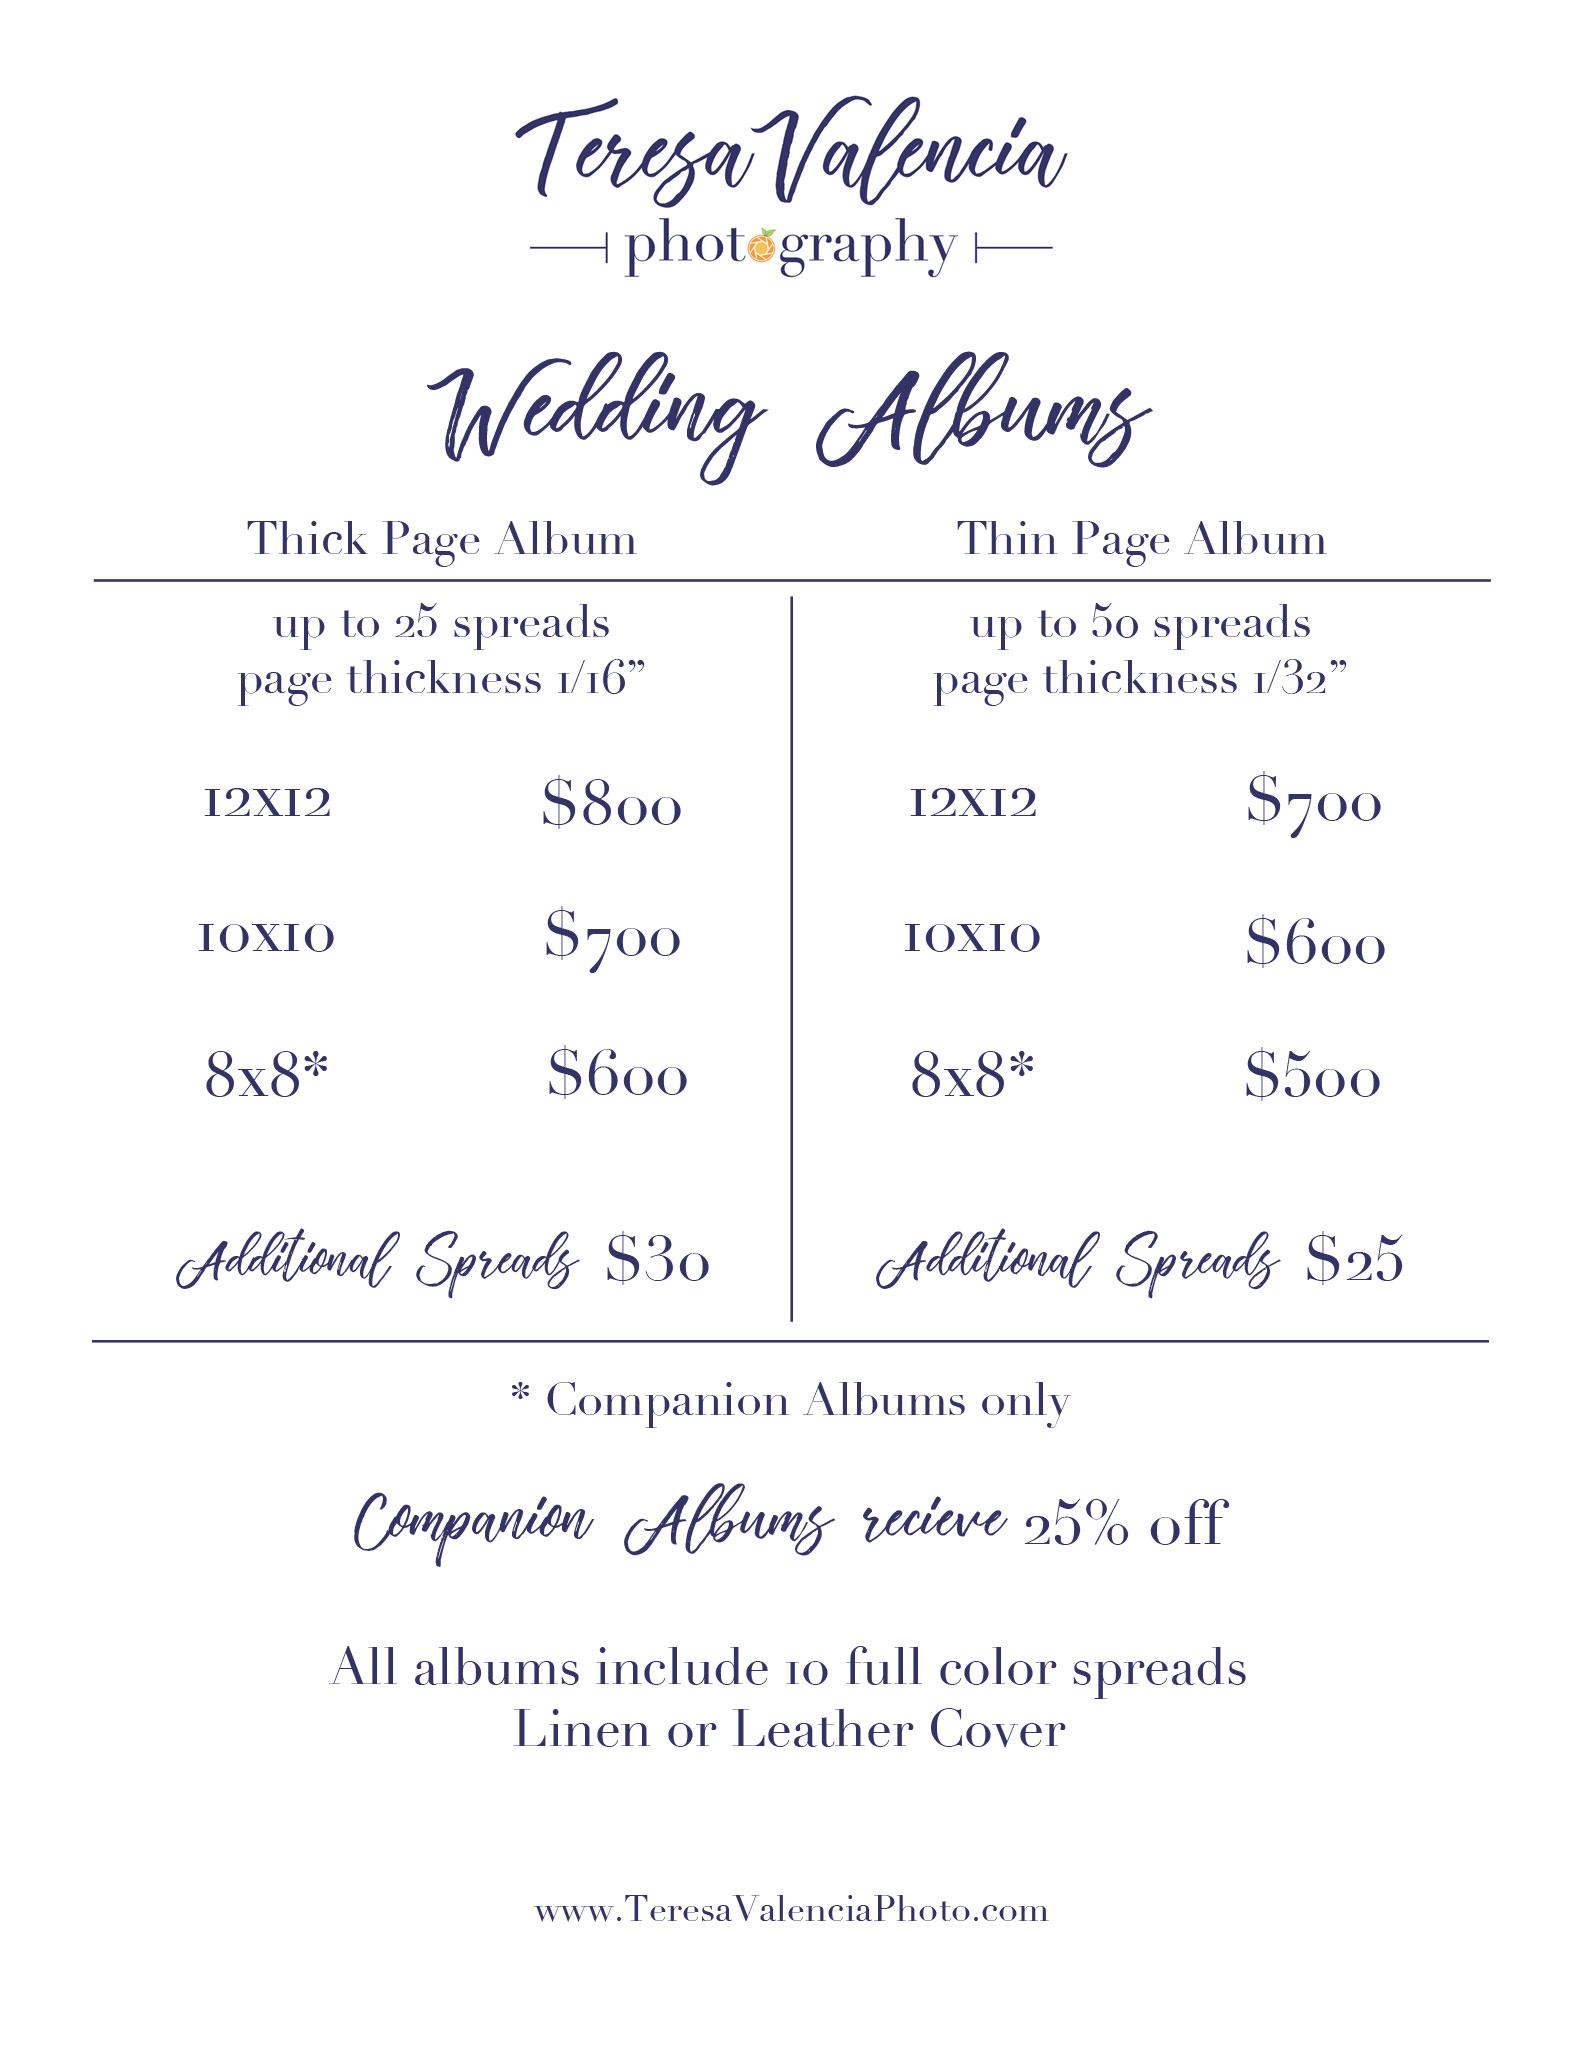 Album-Pricing_web.jpgWedding Album Pricing from Teresa Valencia Photography